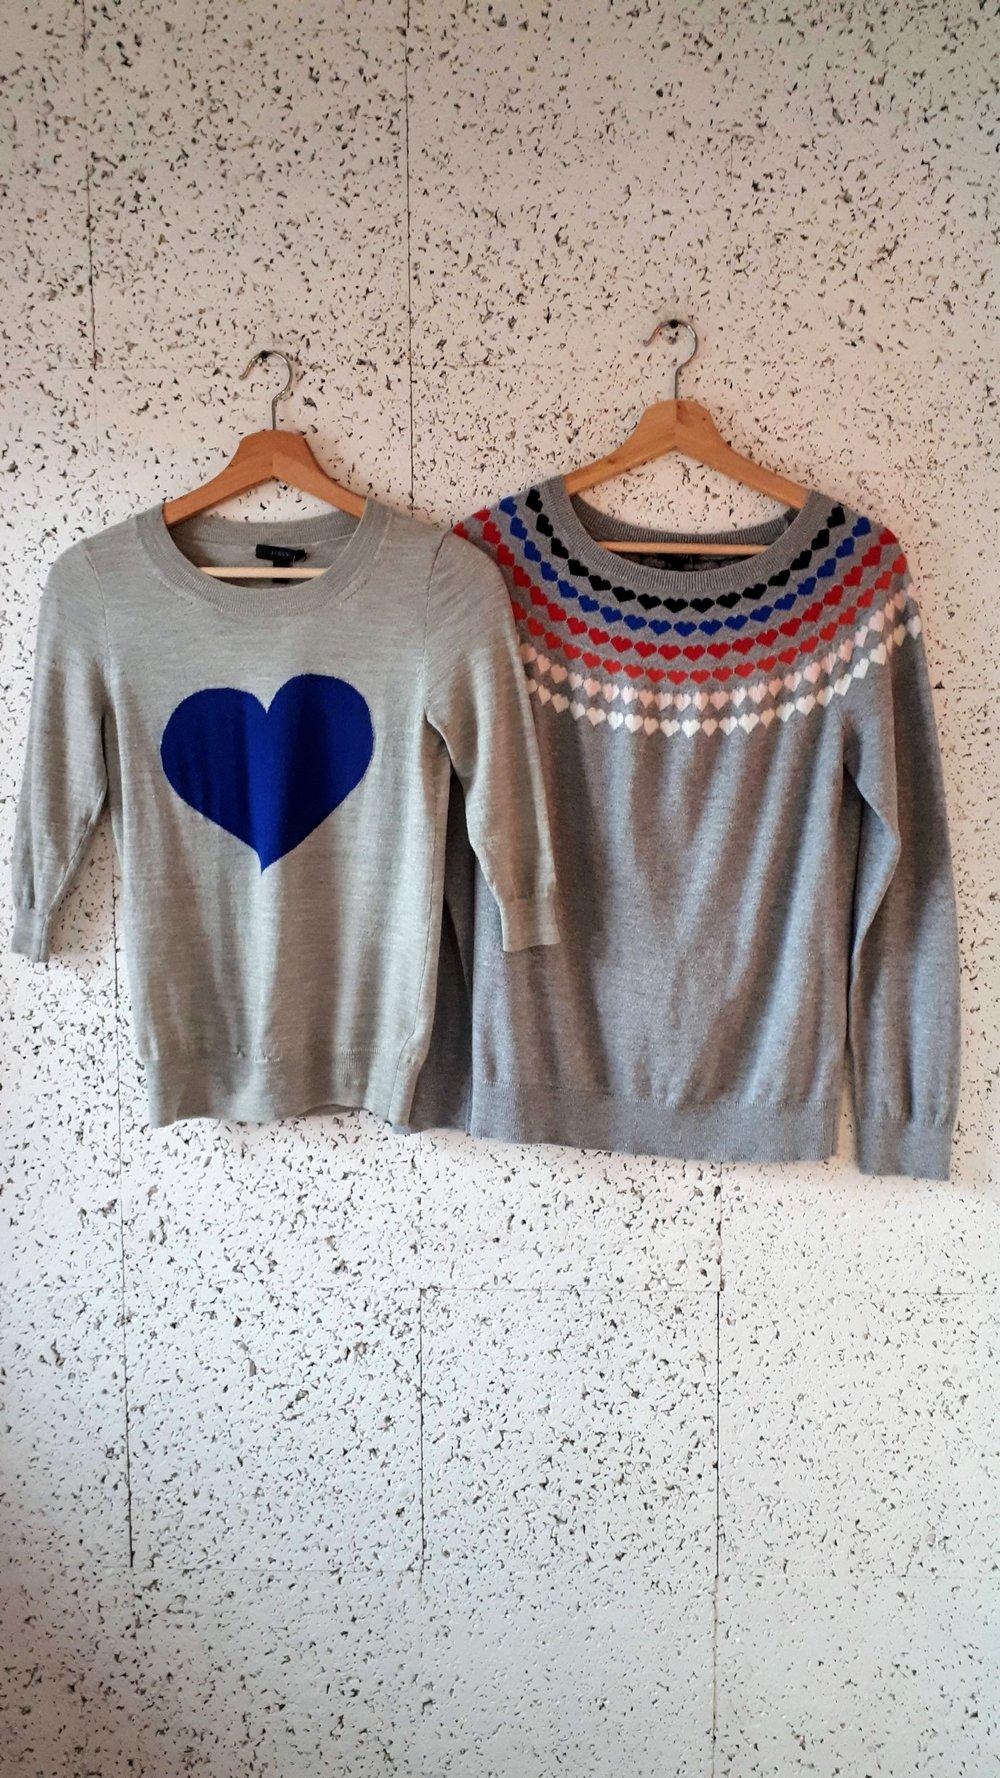 J Crew sweater; Size XS, $28. Talbots sweater; Size M, $28